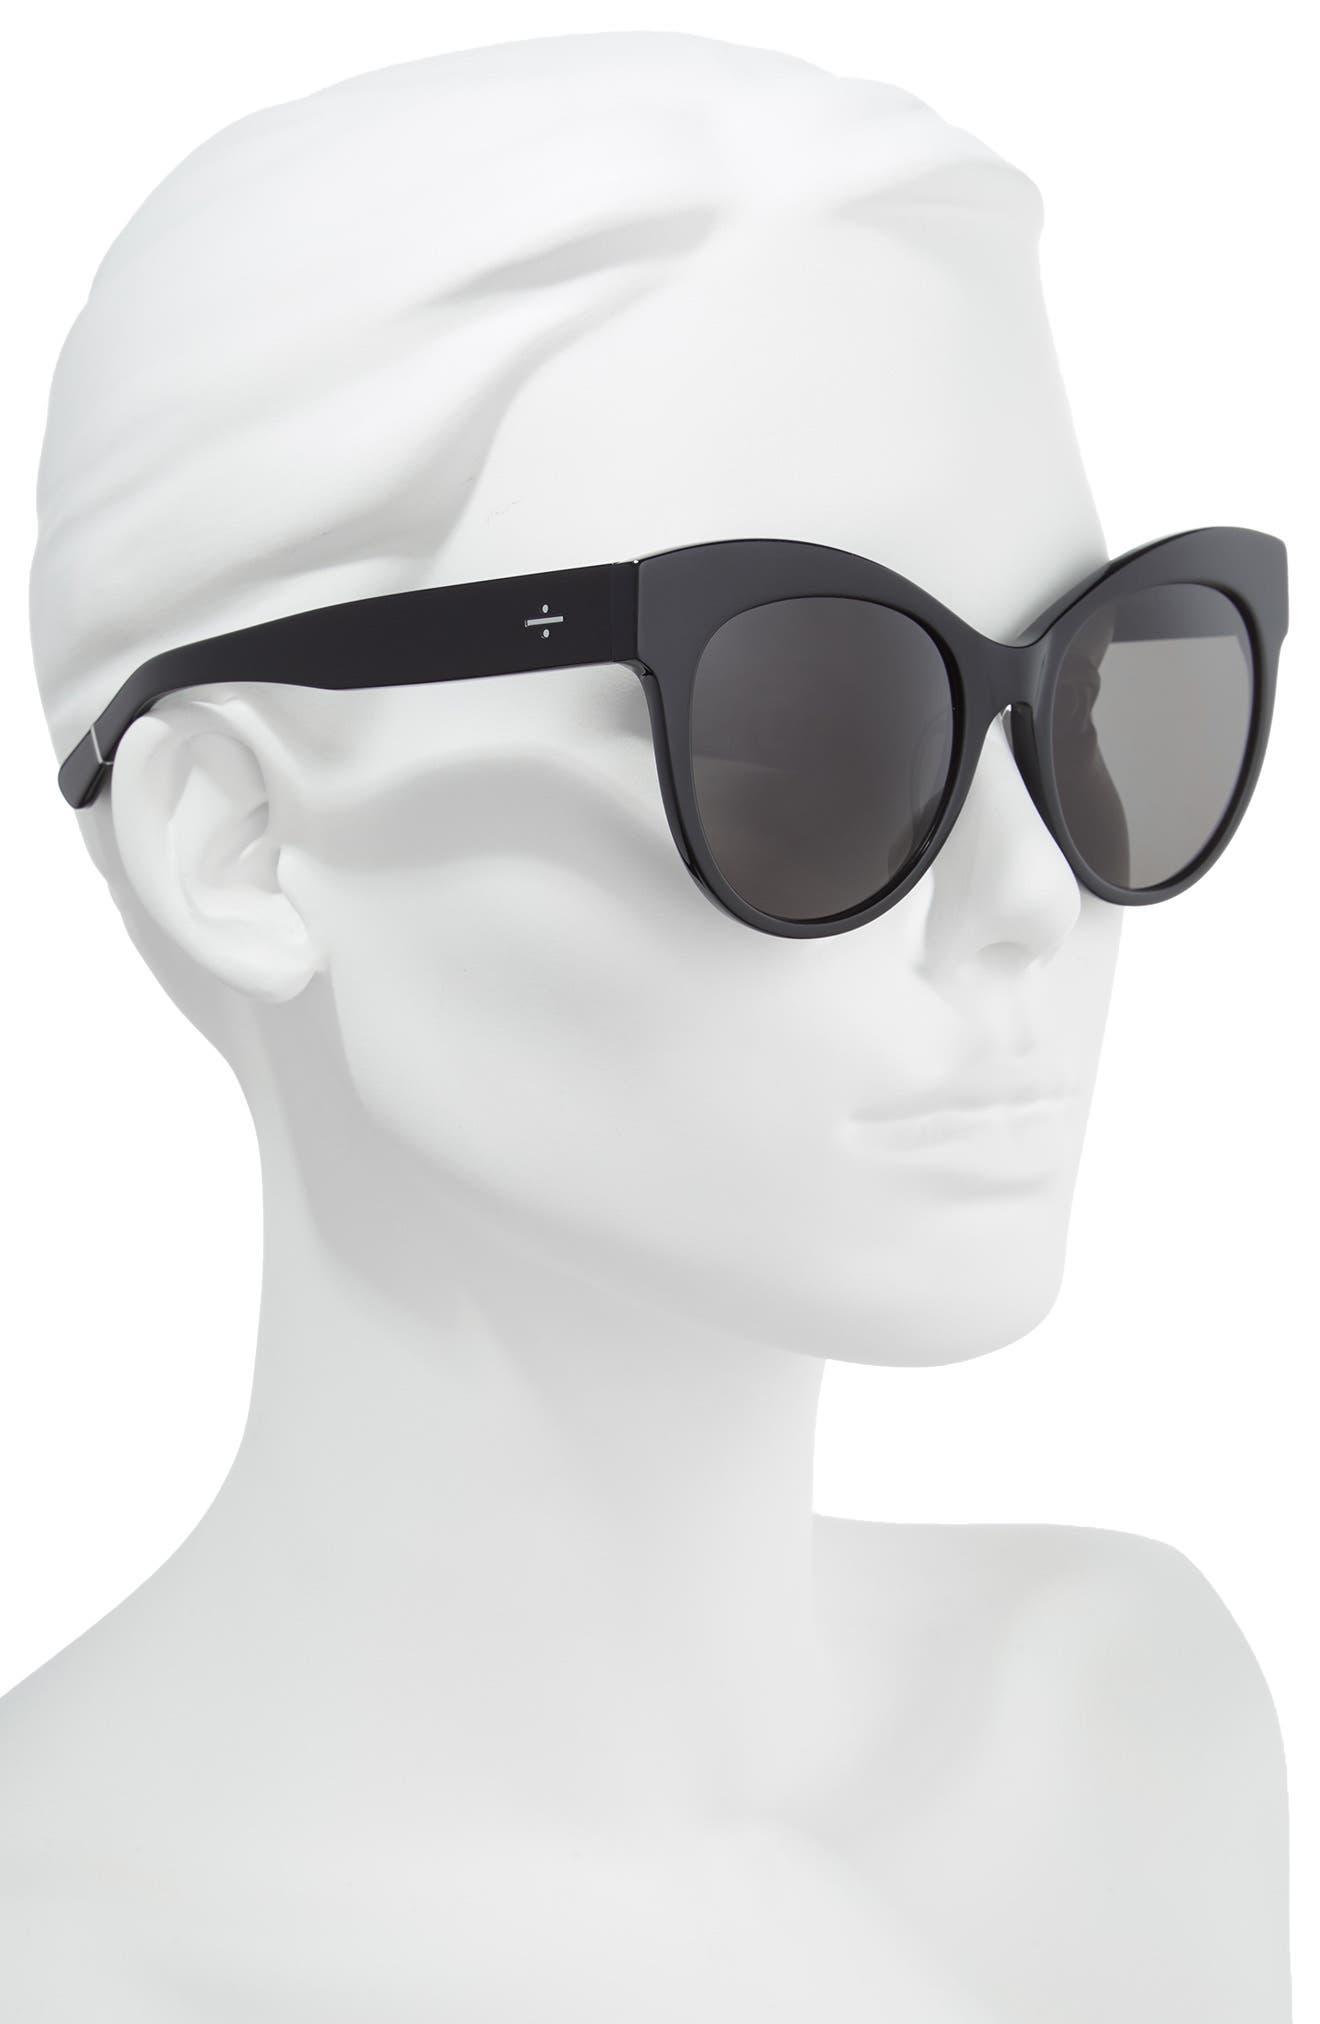 BLANC & ECLARE Paris 55mm Polarized Cat Eye Sunglasses,                             Alternate thumbnail 2, color,                             001